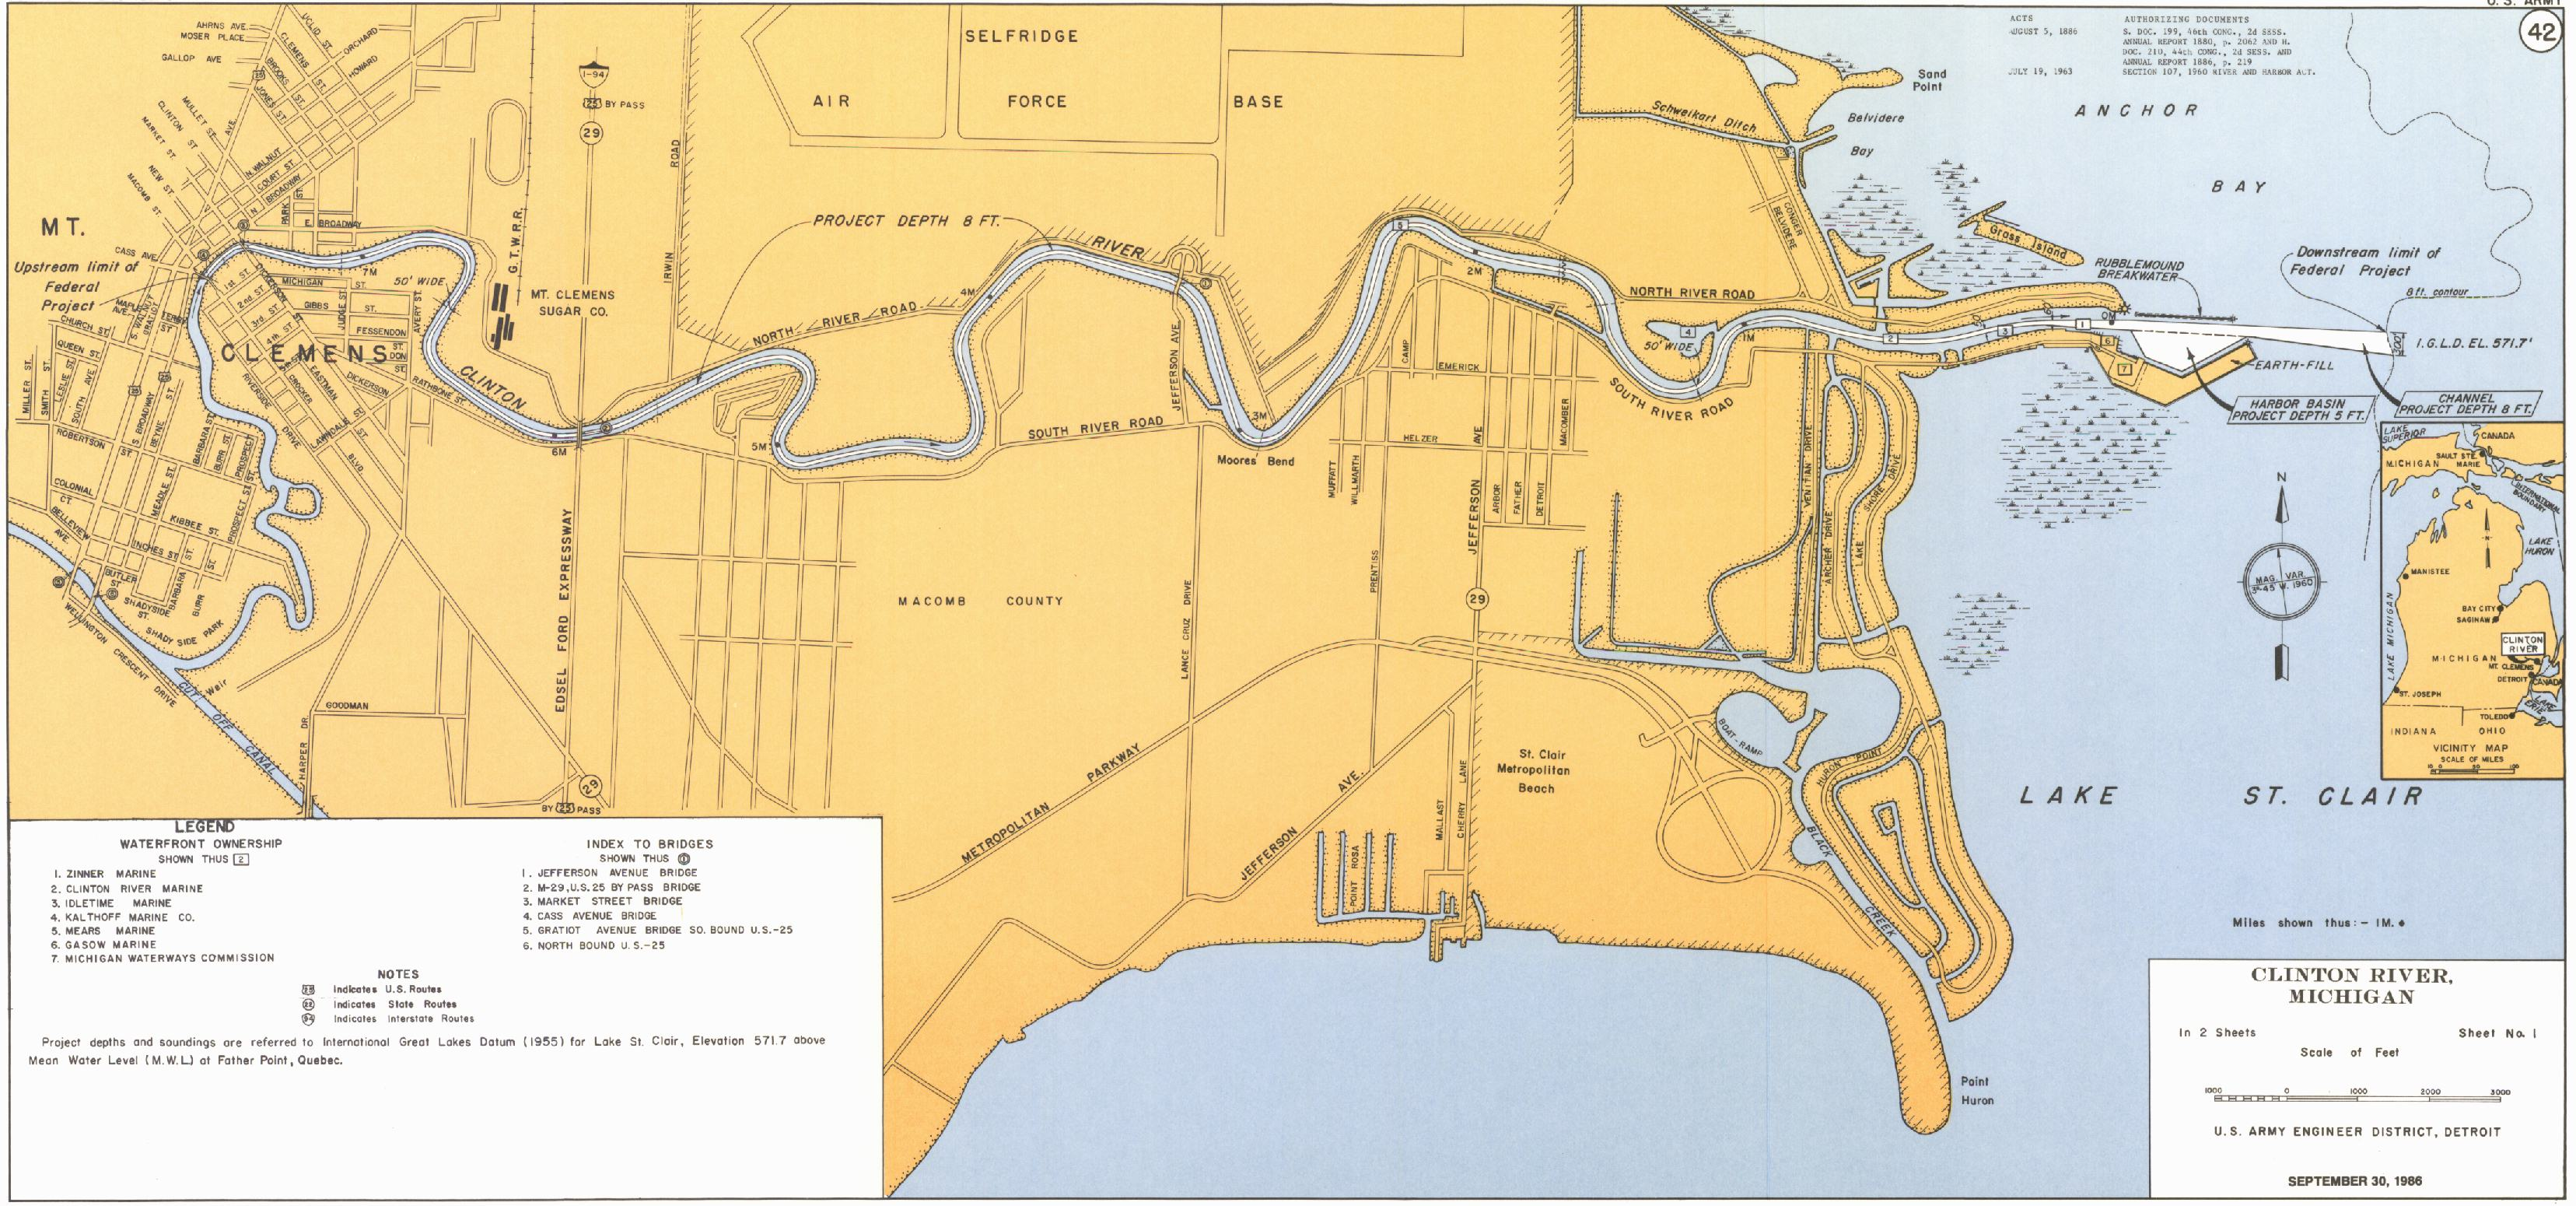 Detroit District Gt Missions Gt Operations Gt Clinton River Mi